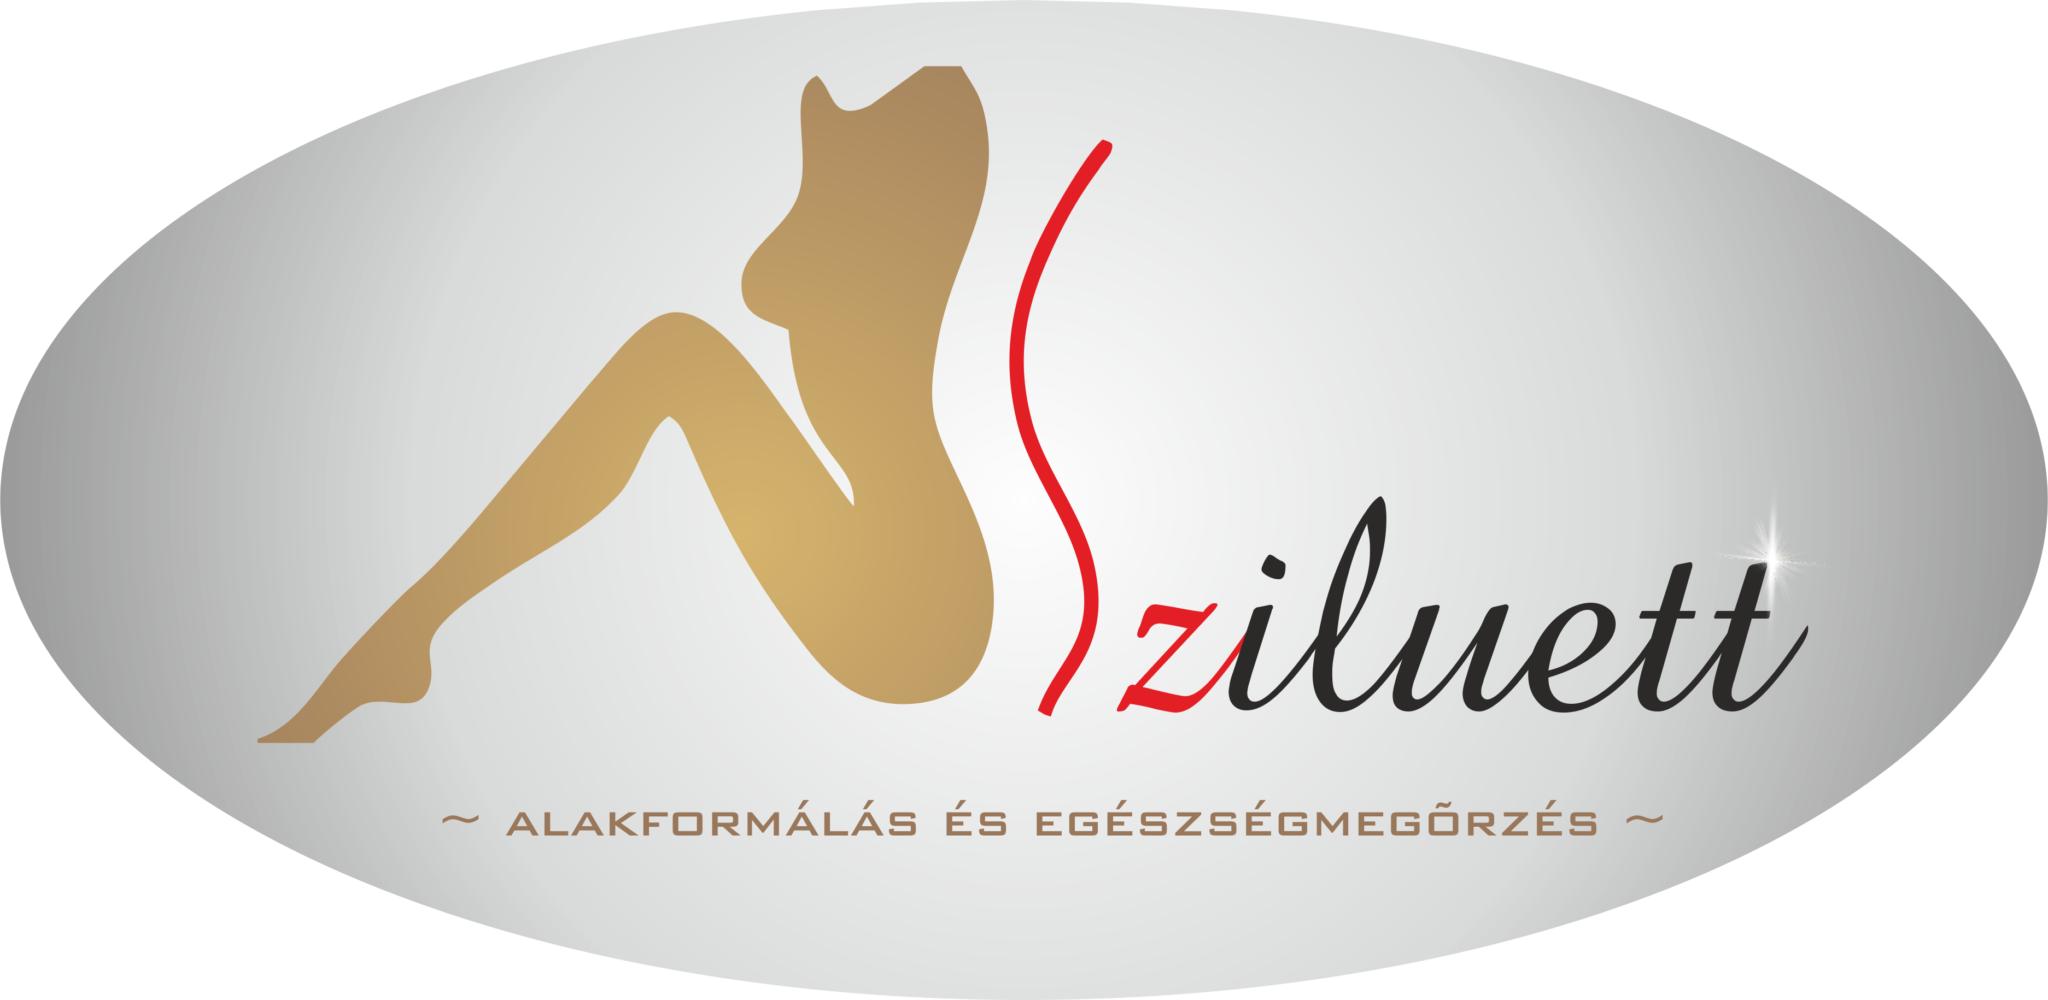 Sziluett logo